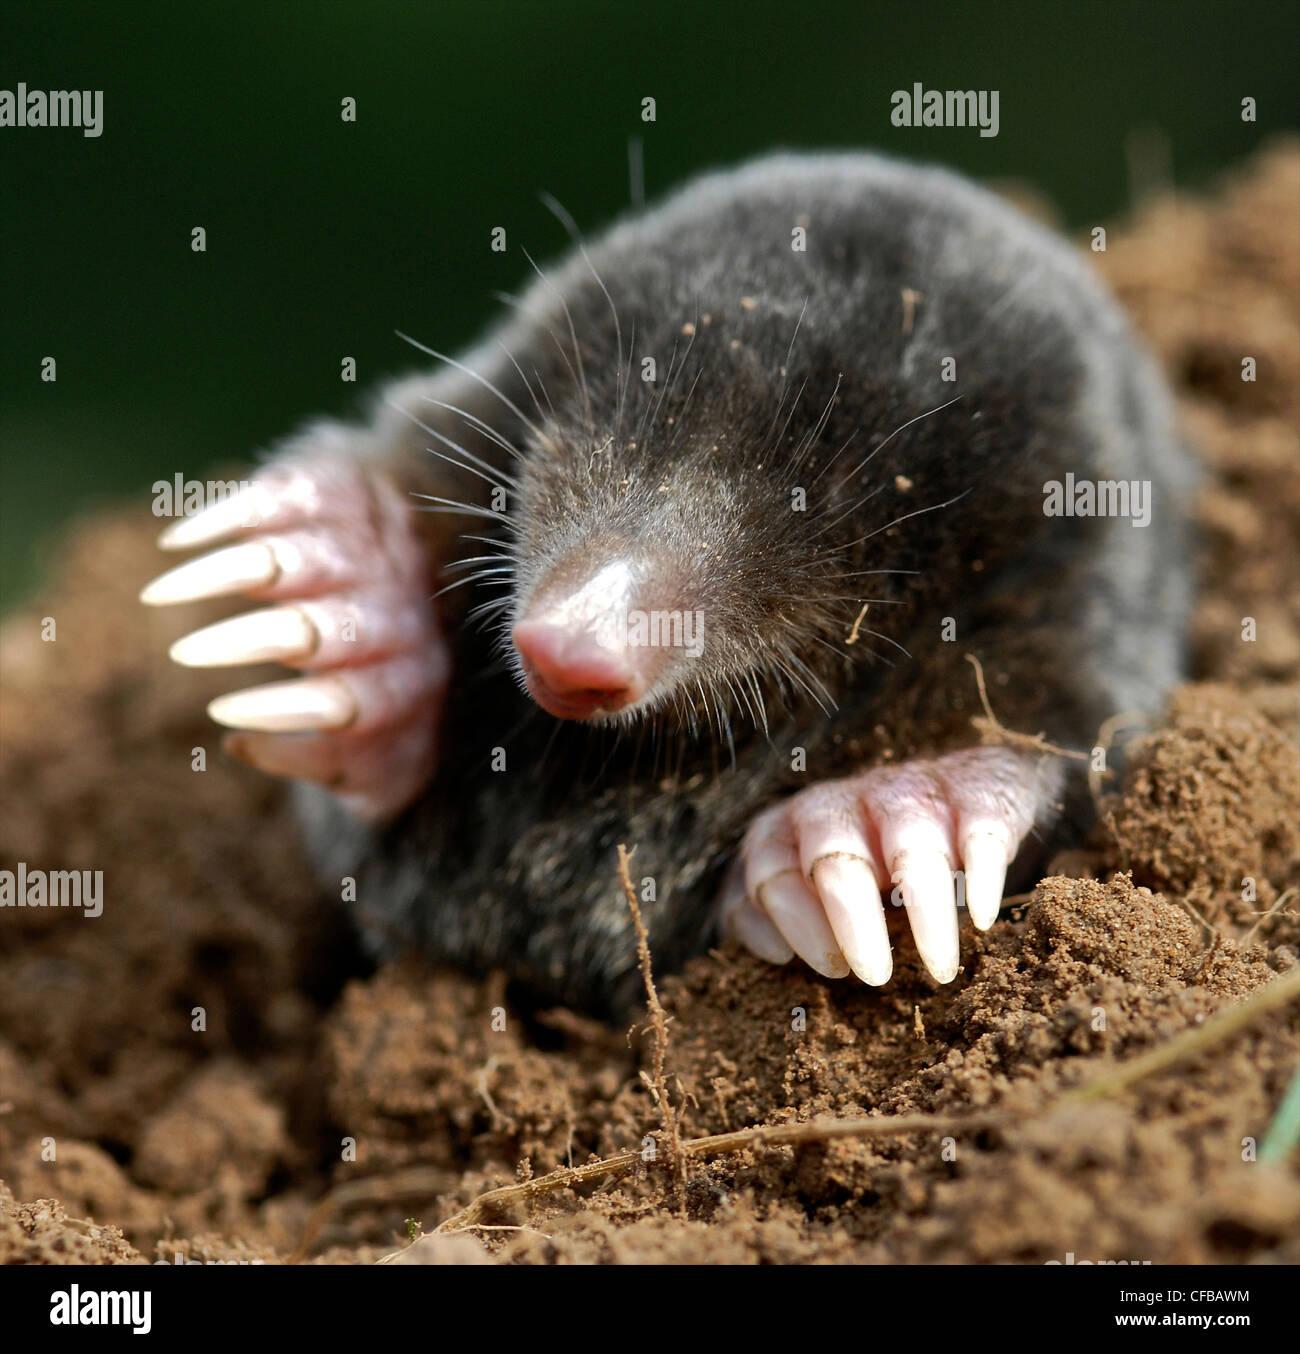 MOLE Common Mole (Talpa europaea) Common mammal but rarely seen, the mole spends most of its life below ground, - Stock Image